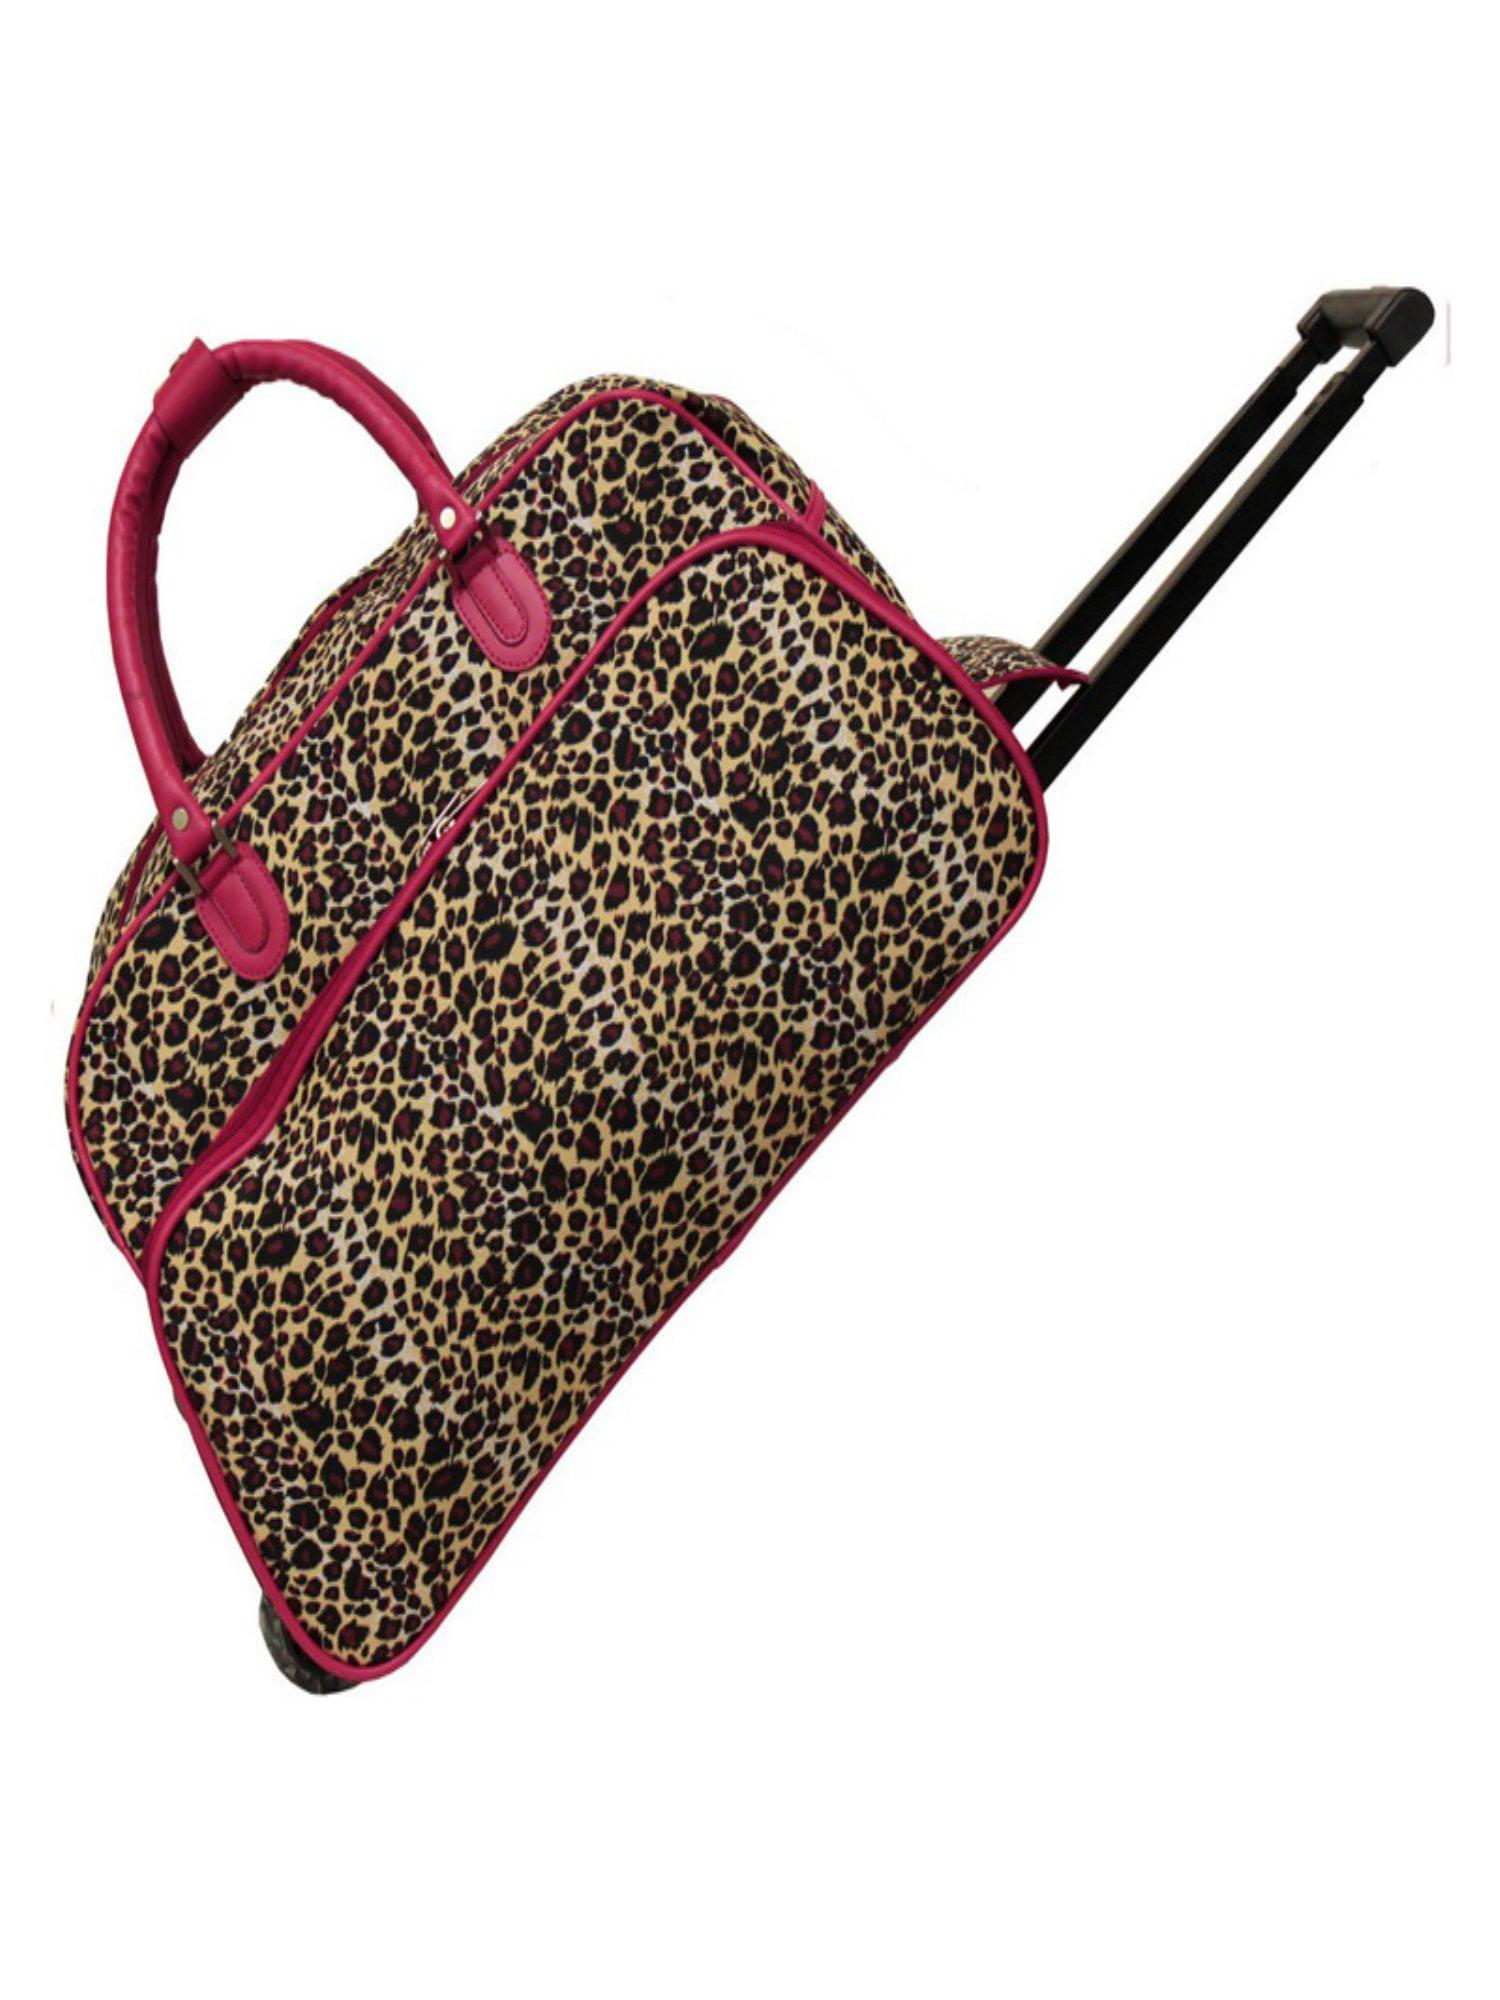 World Traveler Leopard 21 in. Rolling Duffel Bag by World Traveler